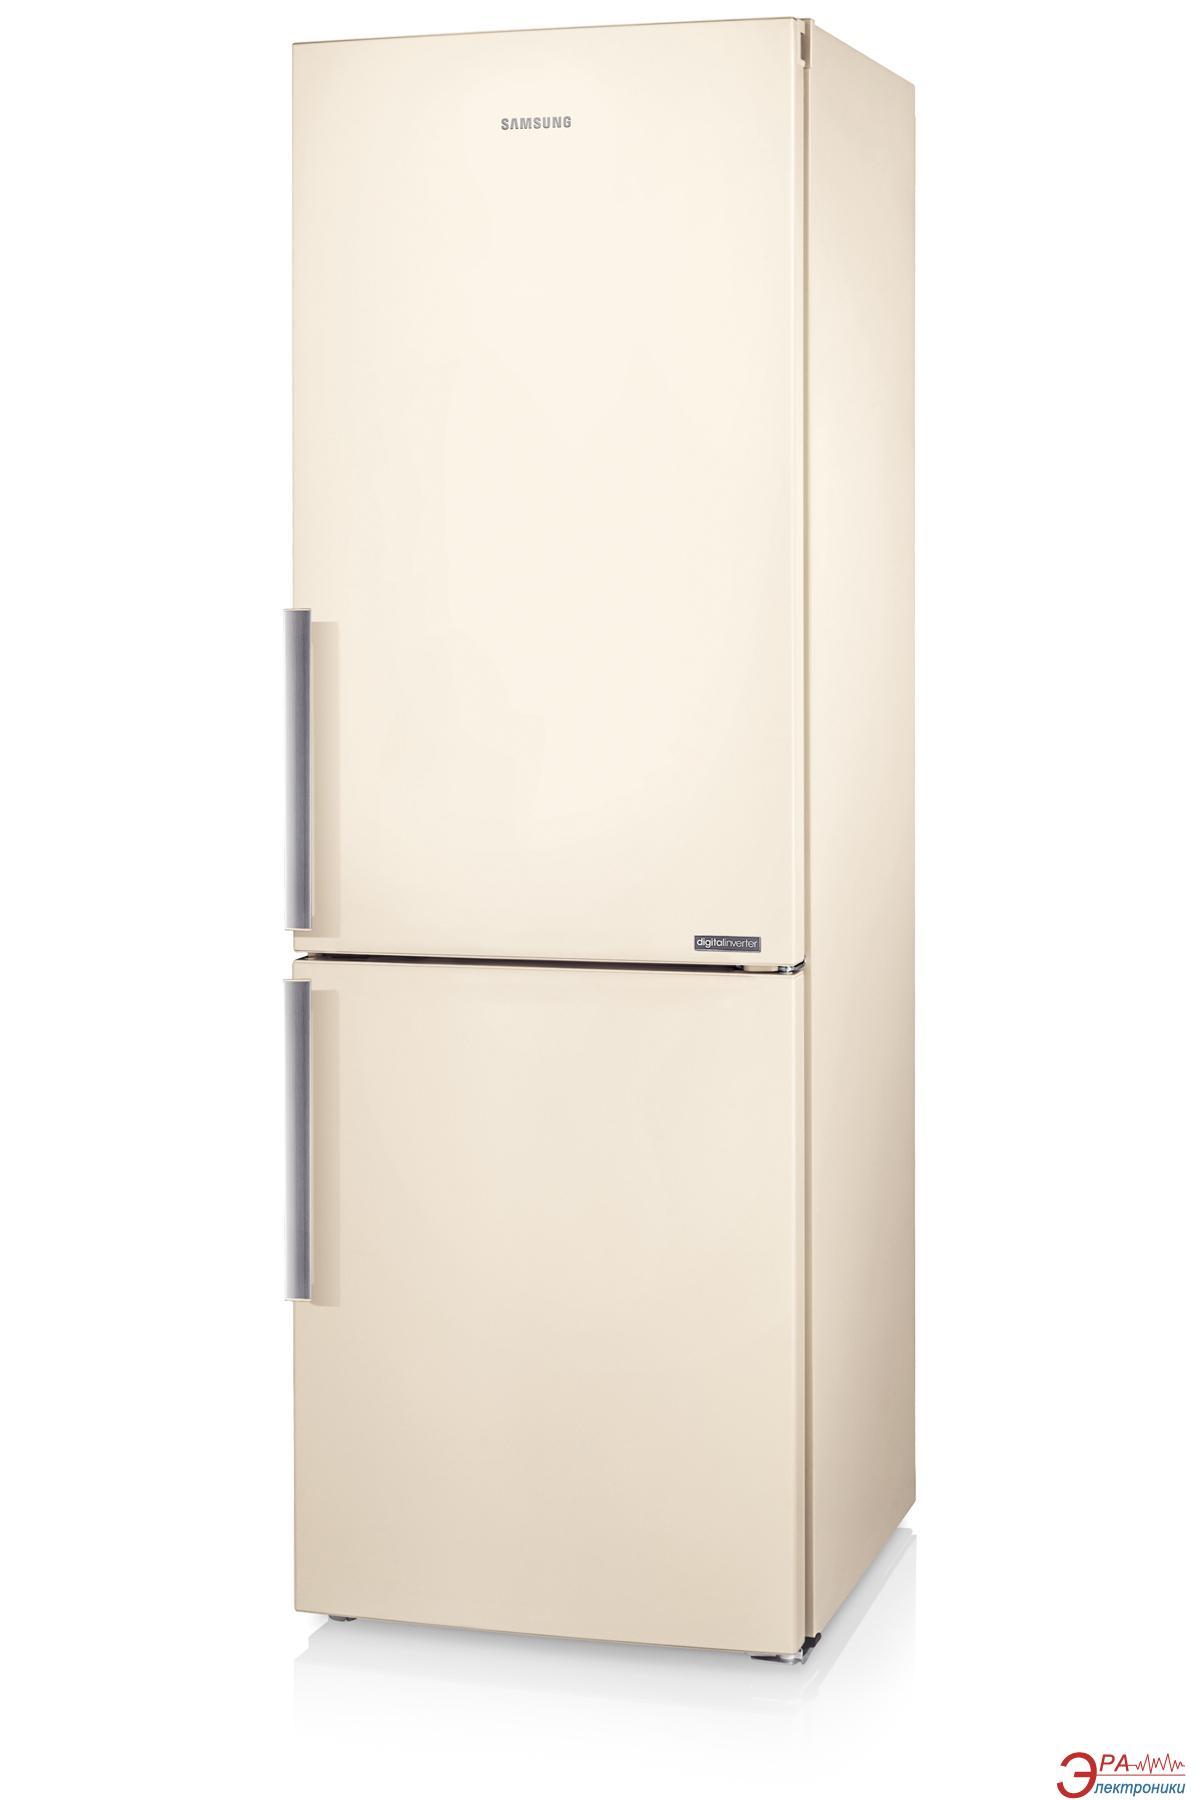 самсунг холодильник двухкамерный ремонт